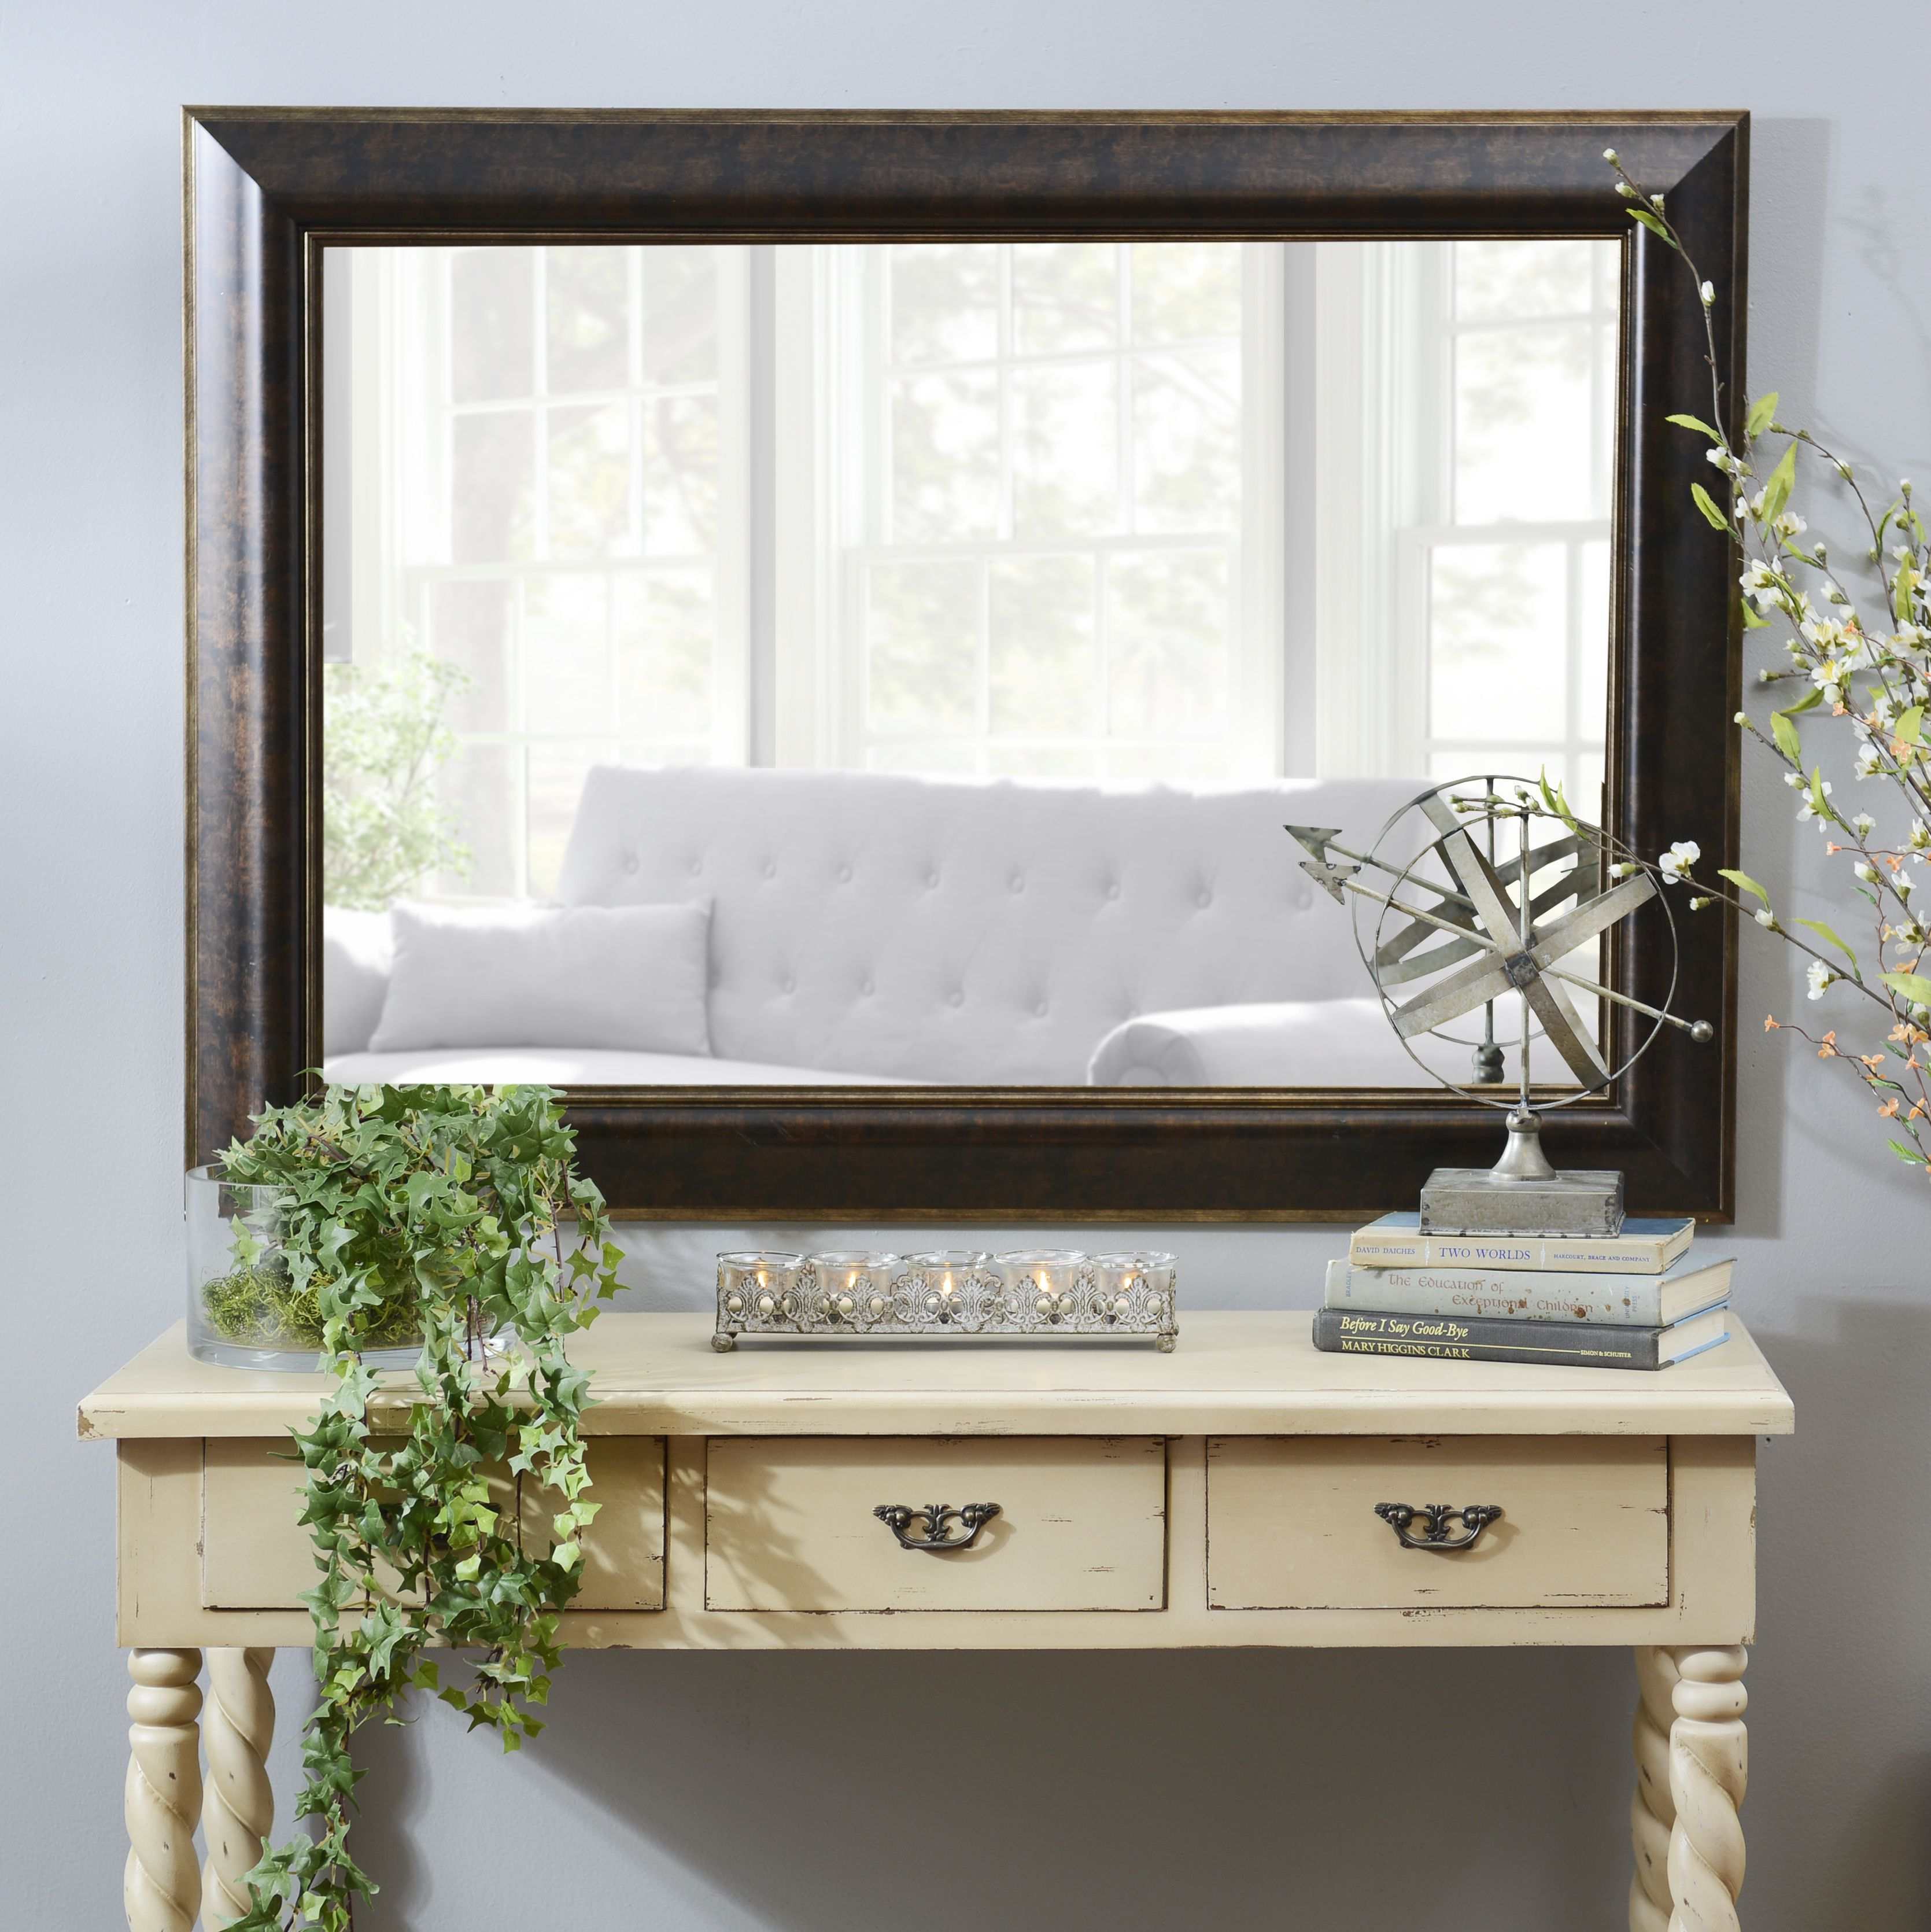 Bronze & Gold Framed Mirror, 32X44 In - Gold Framed